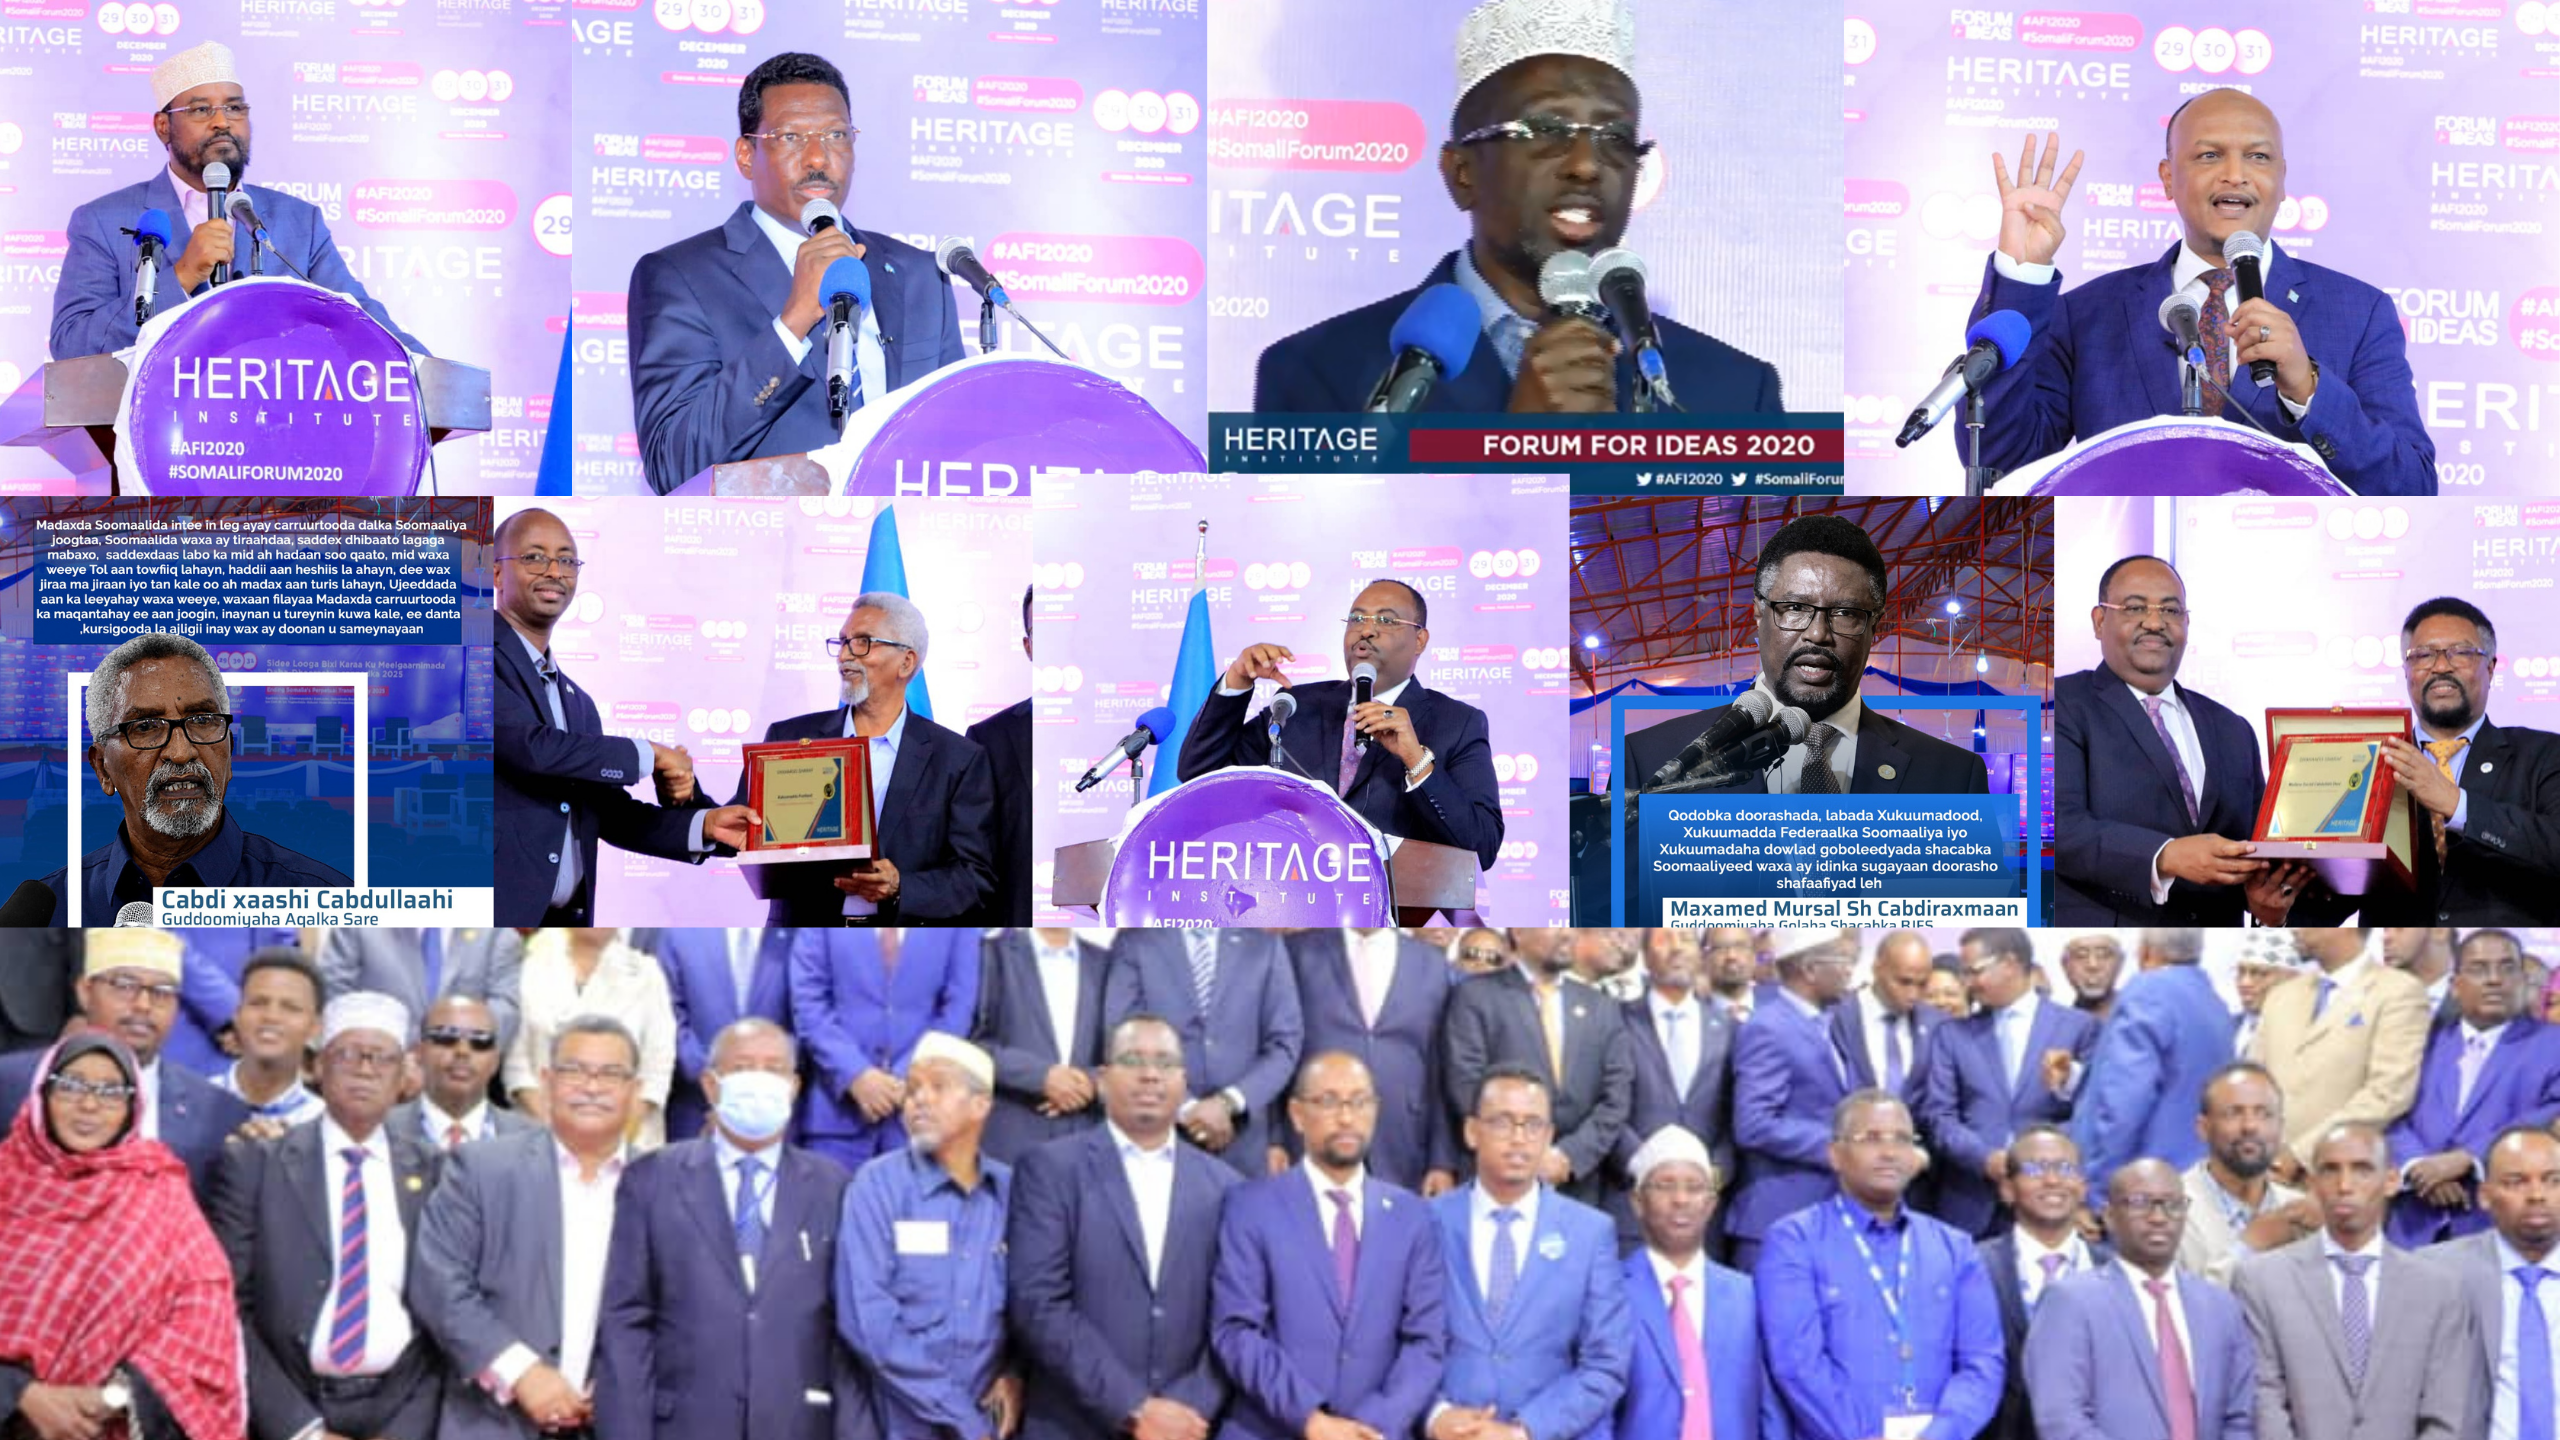 Resignation of President Farmajo Is the Right Option before Somalia Falls Apart